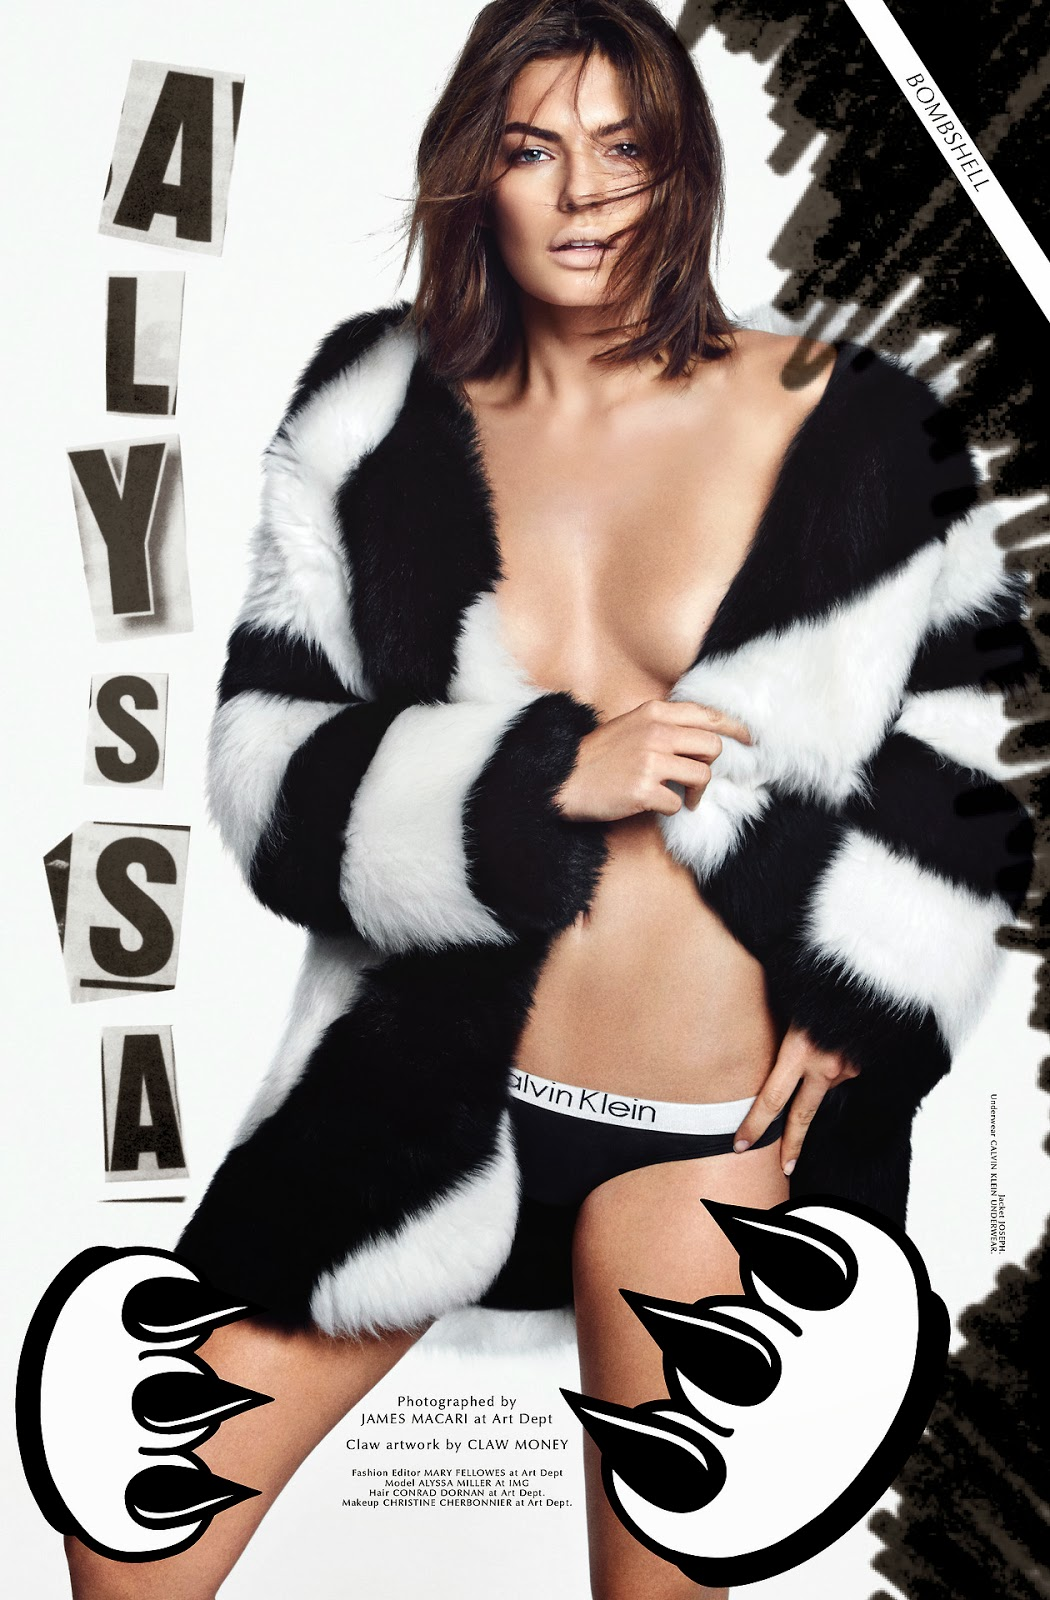 Magazine Photoshoot: Alyssa Miller Magazine Photoshoot by James Macari for Galore Magazine 2014